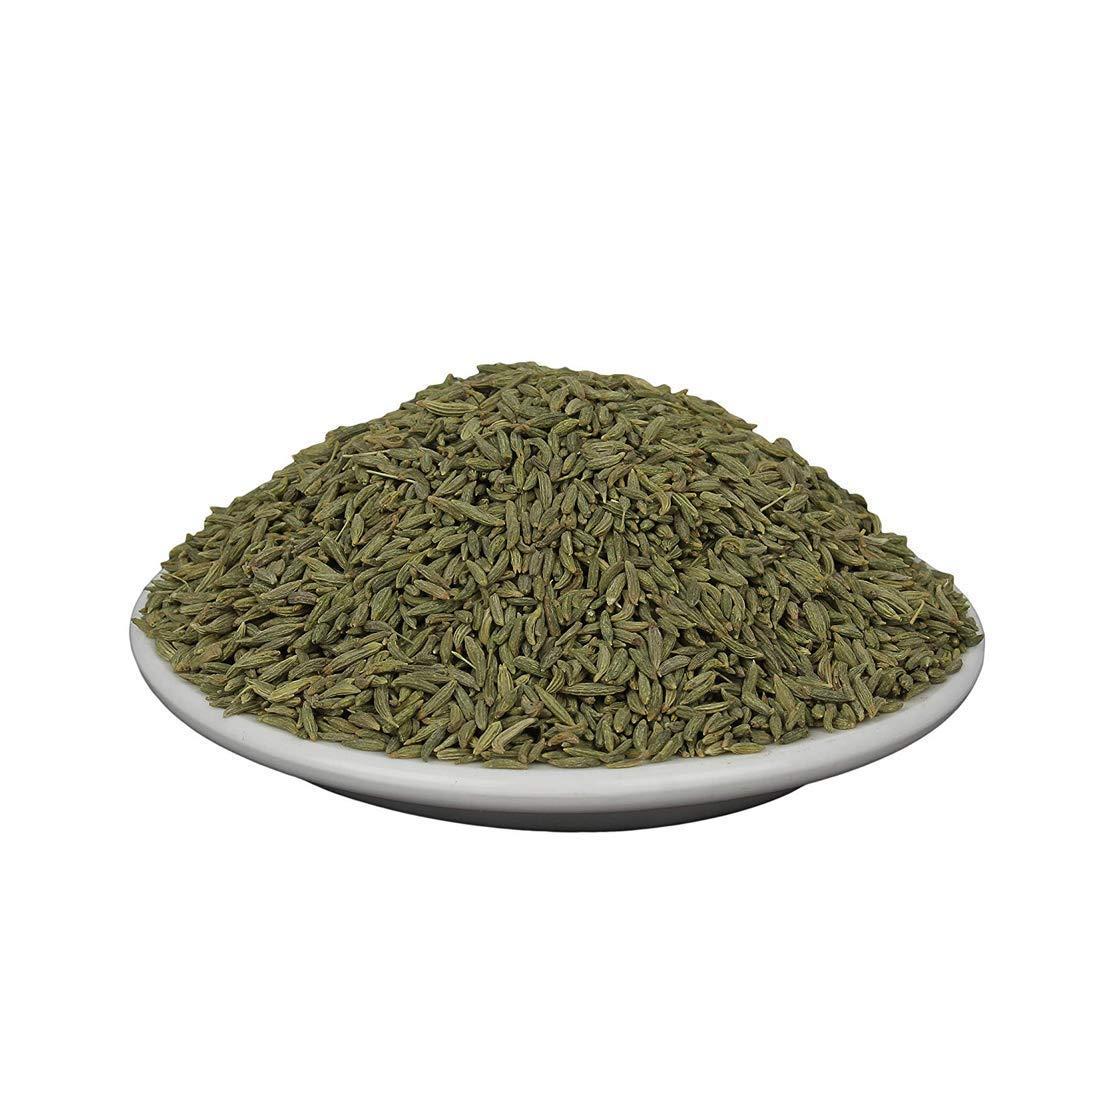 krishna kripa Indian Natural Jadi Booti Sonf Choti/Saunf Barik/Foeniculum Vulgare/Fennel Small 450 Grams